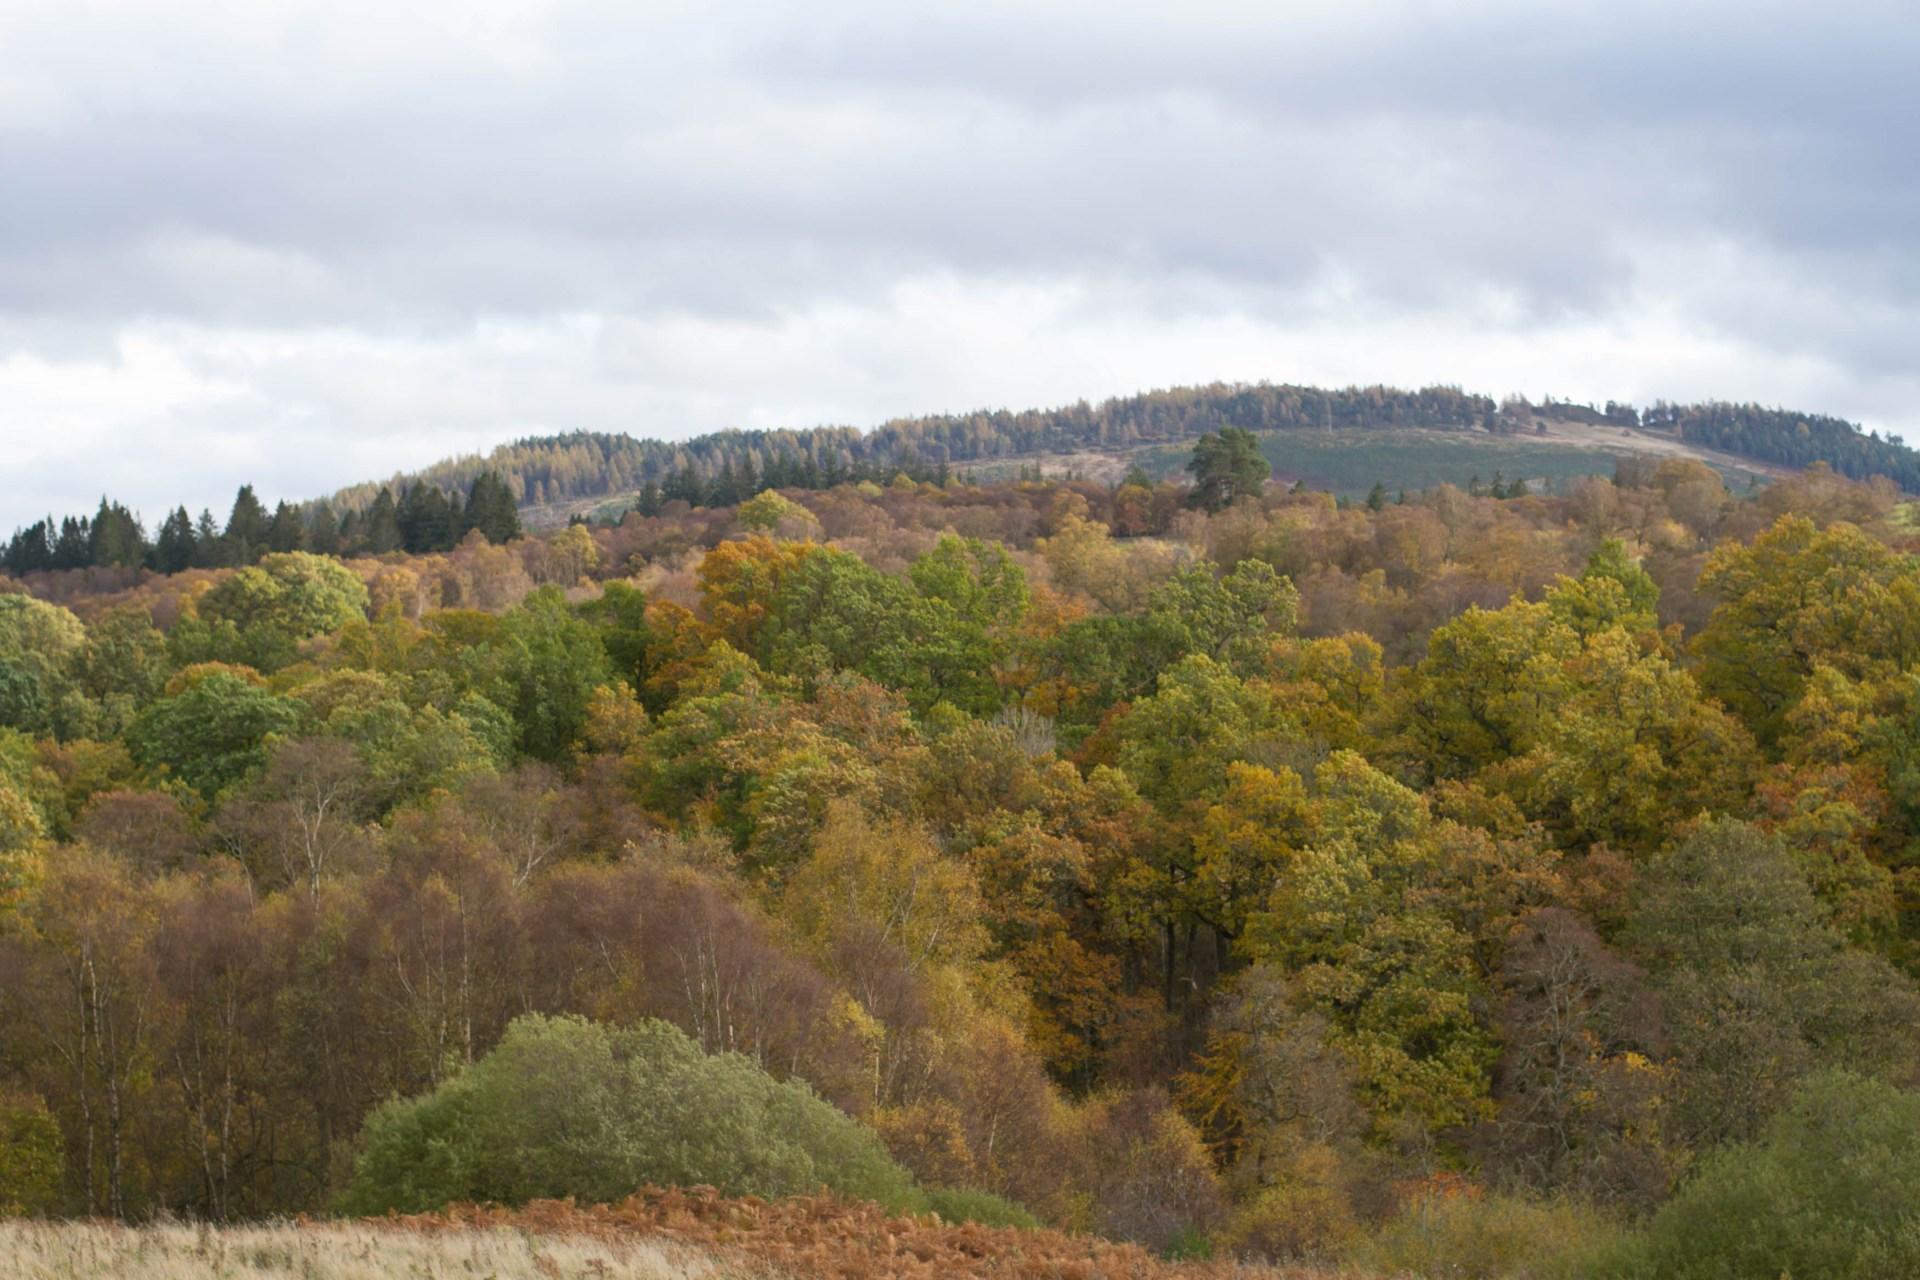 Perthshire woodland